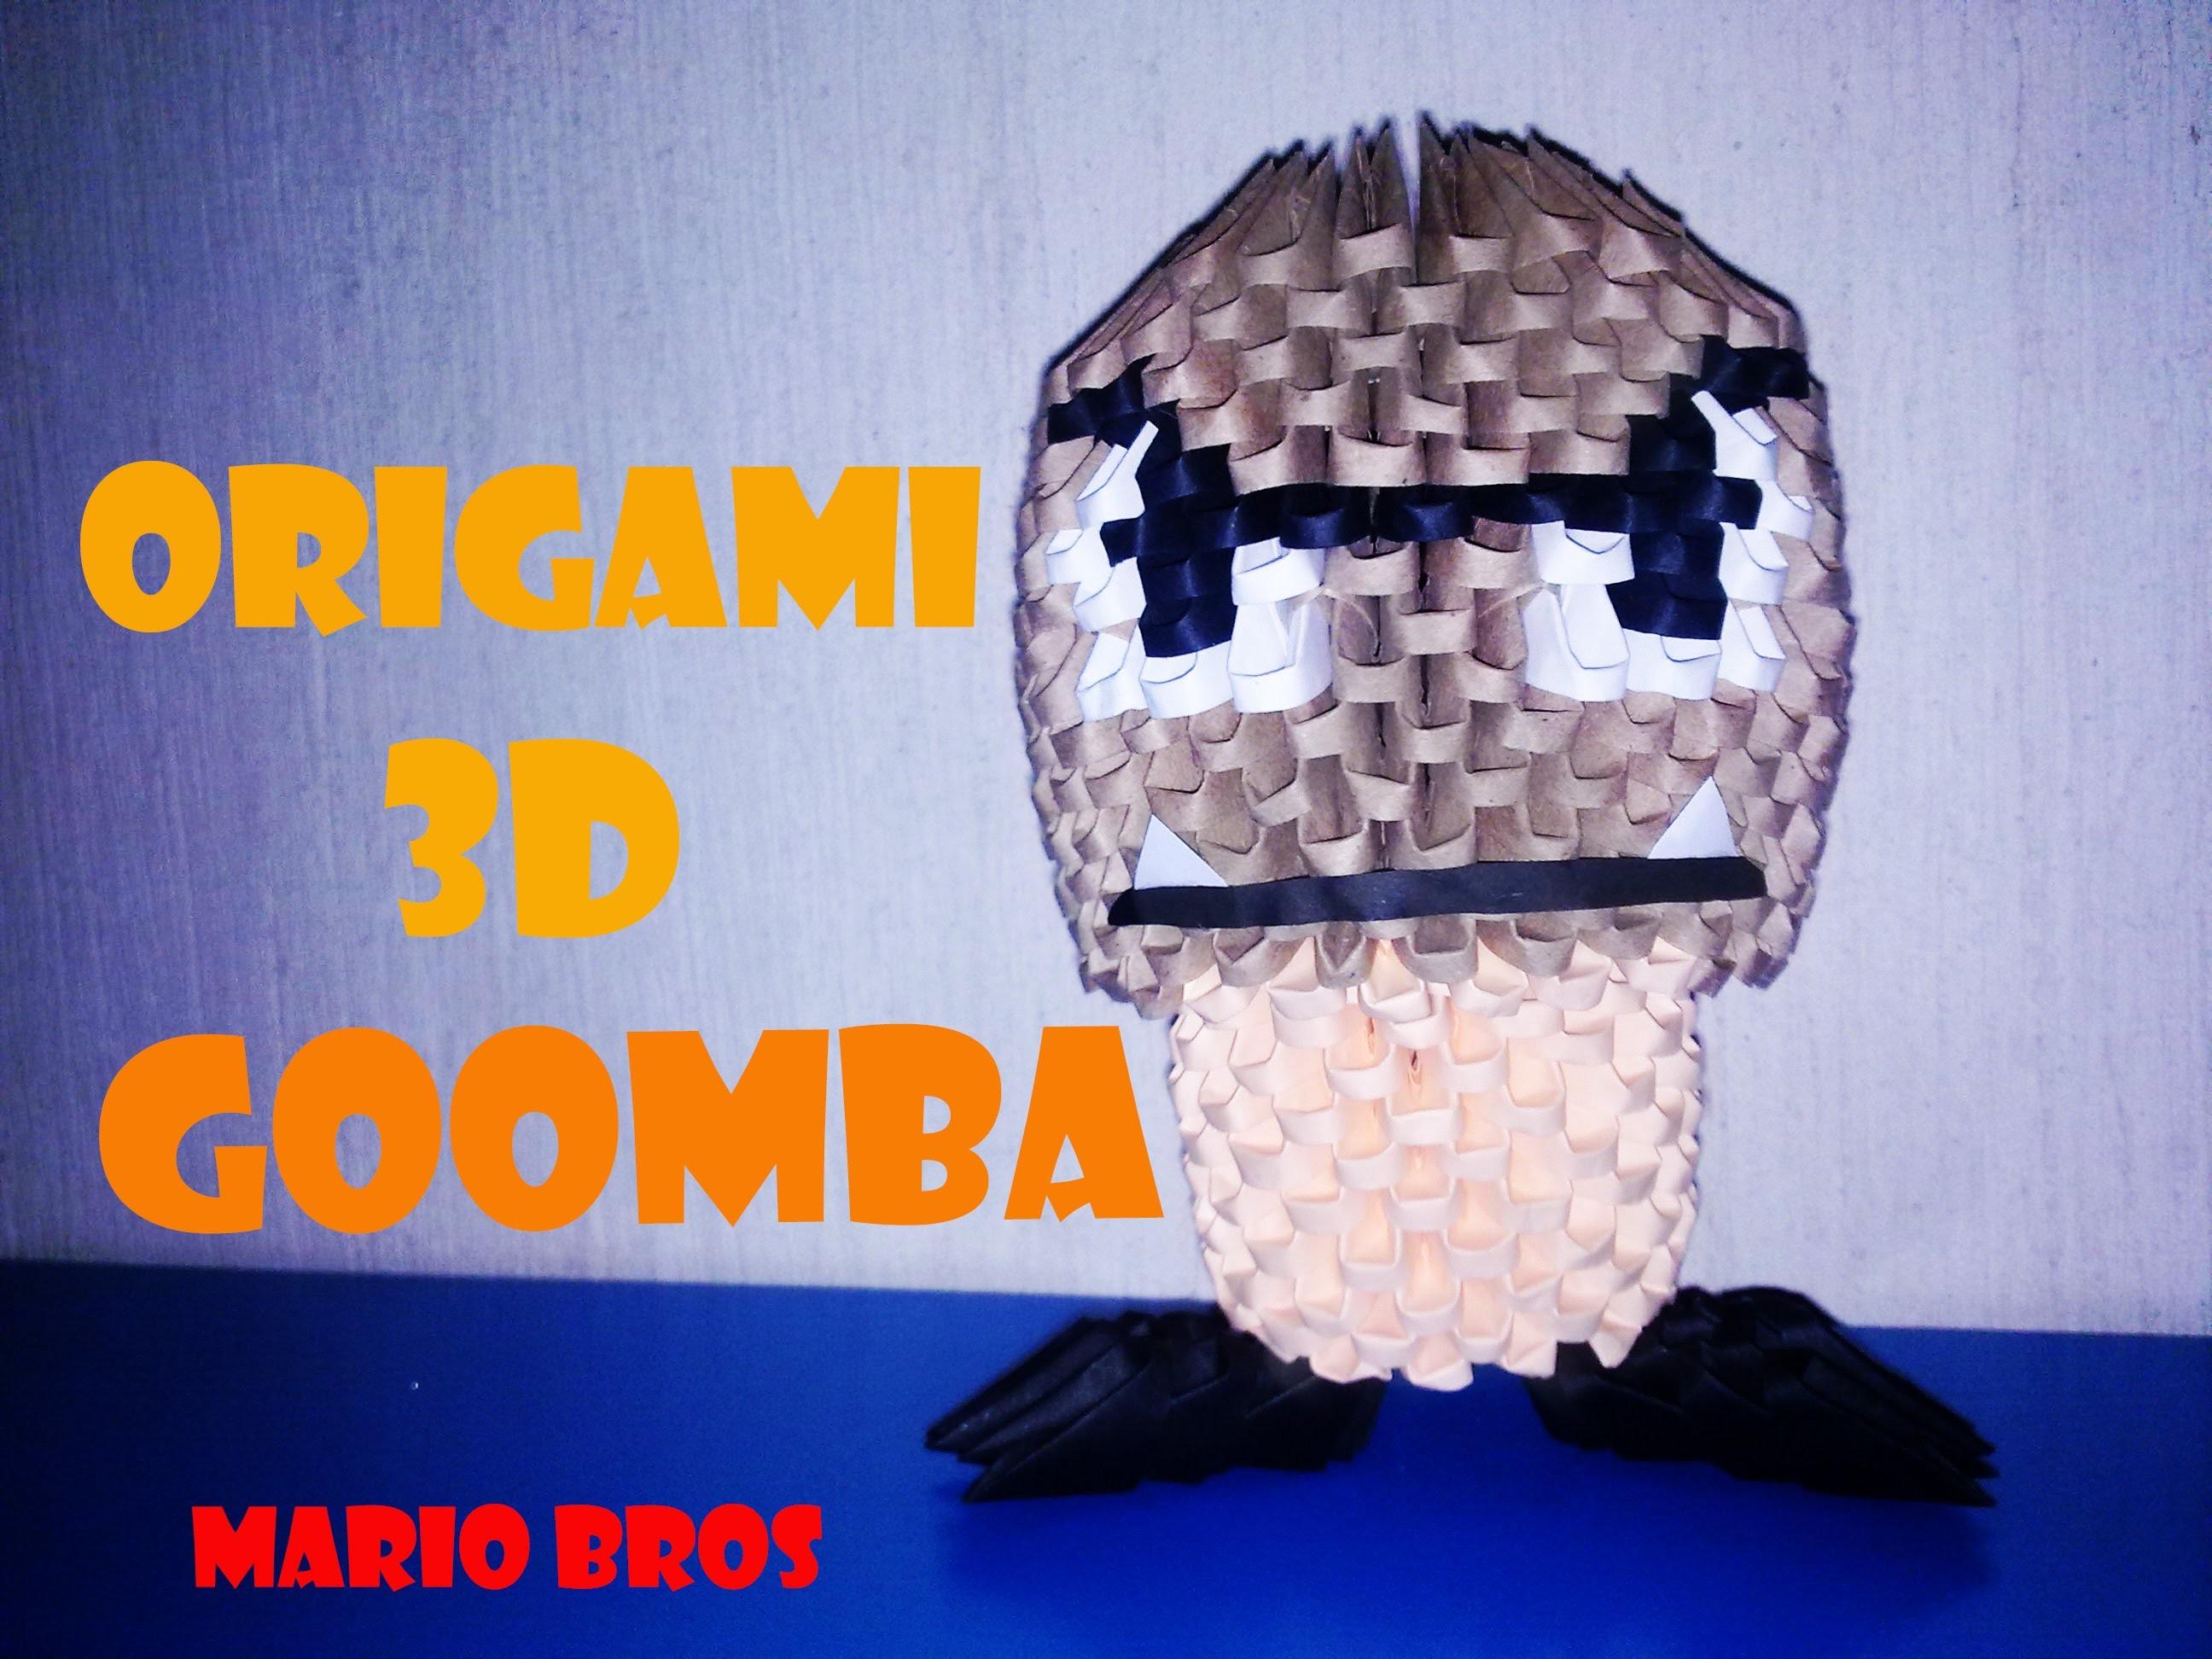 Origami 3D Goomba de Mario Bros